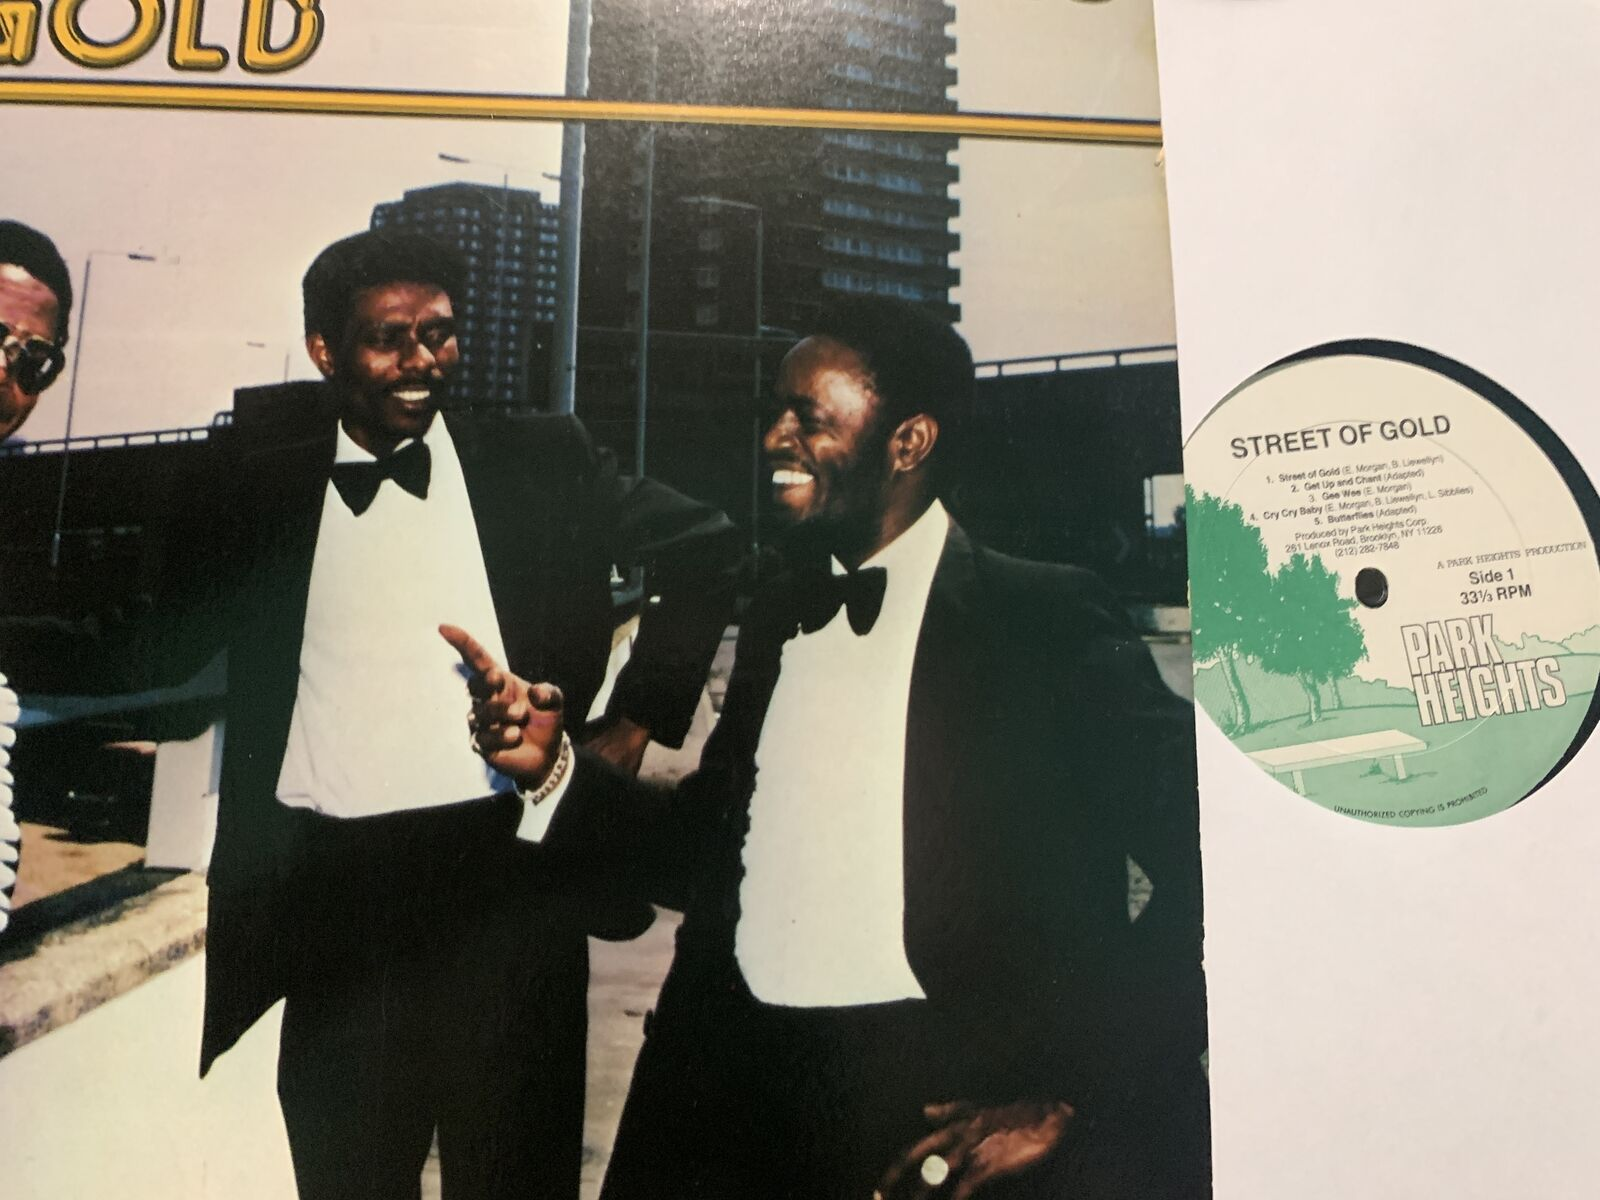 HEPTONES -STREET OF GOLD /GET UP & CHANT /BUTTERFLIES /GEE WEE/PARK HEIGHTS 1981